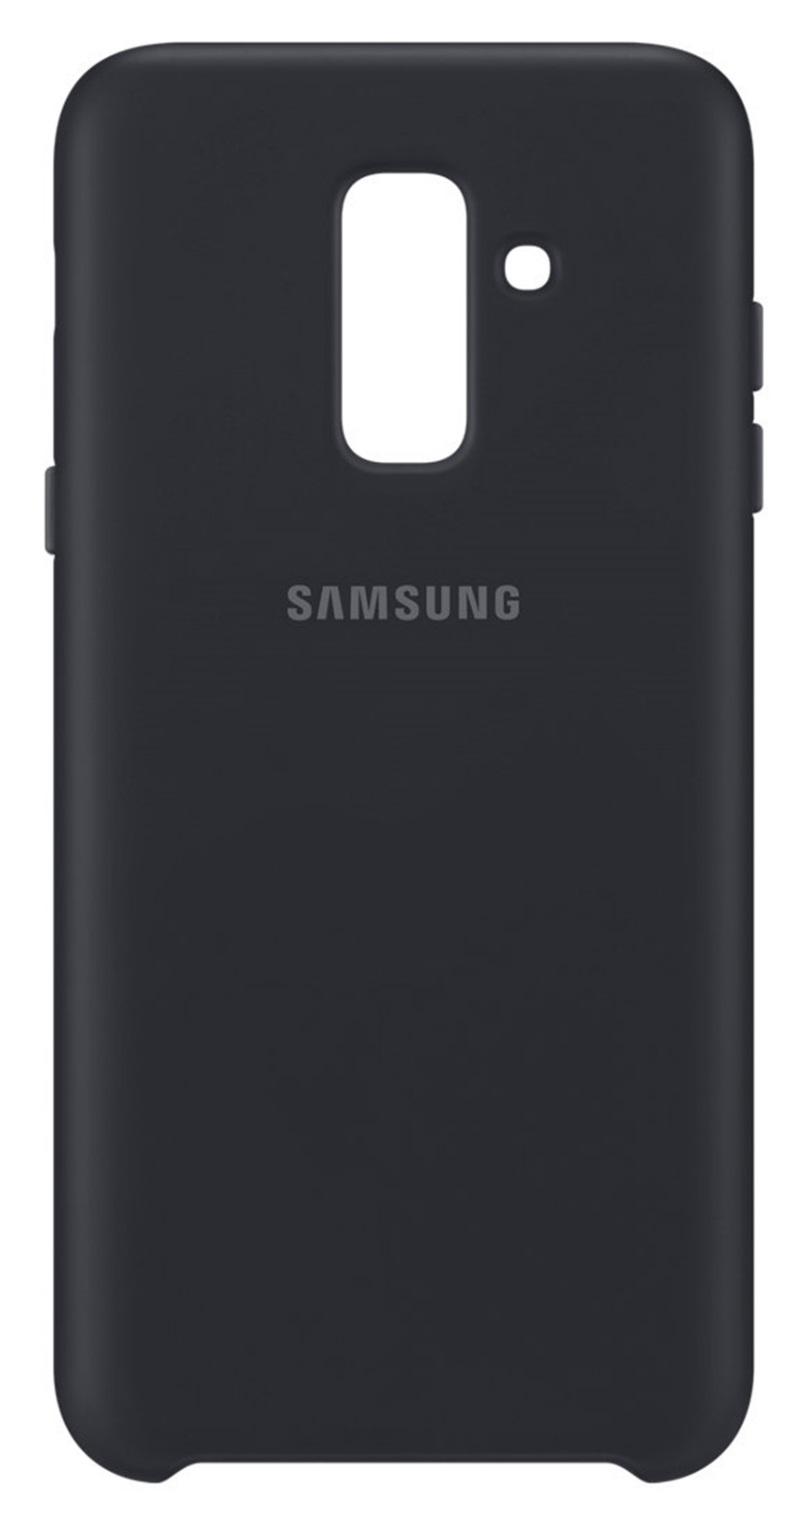 Husa Samsung EF-PA605CBEGWW Dual Layer (plastic + silicon) neagra pentru Samsung Galaxy A6 Plus 2018